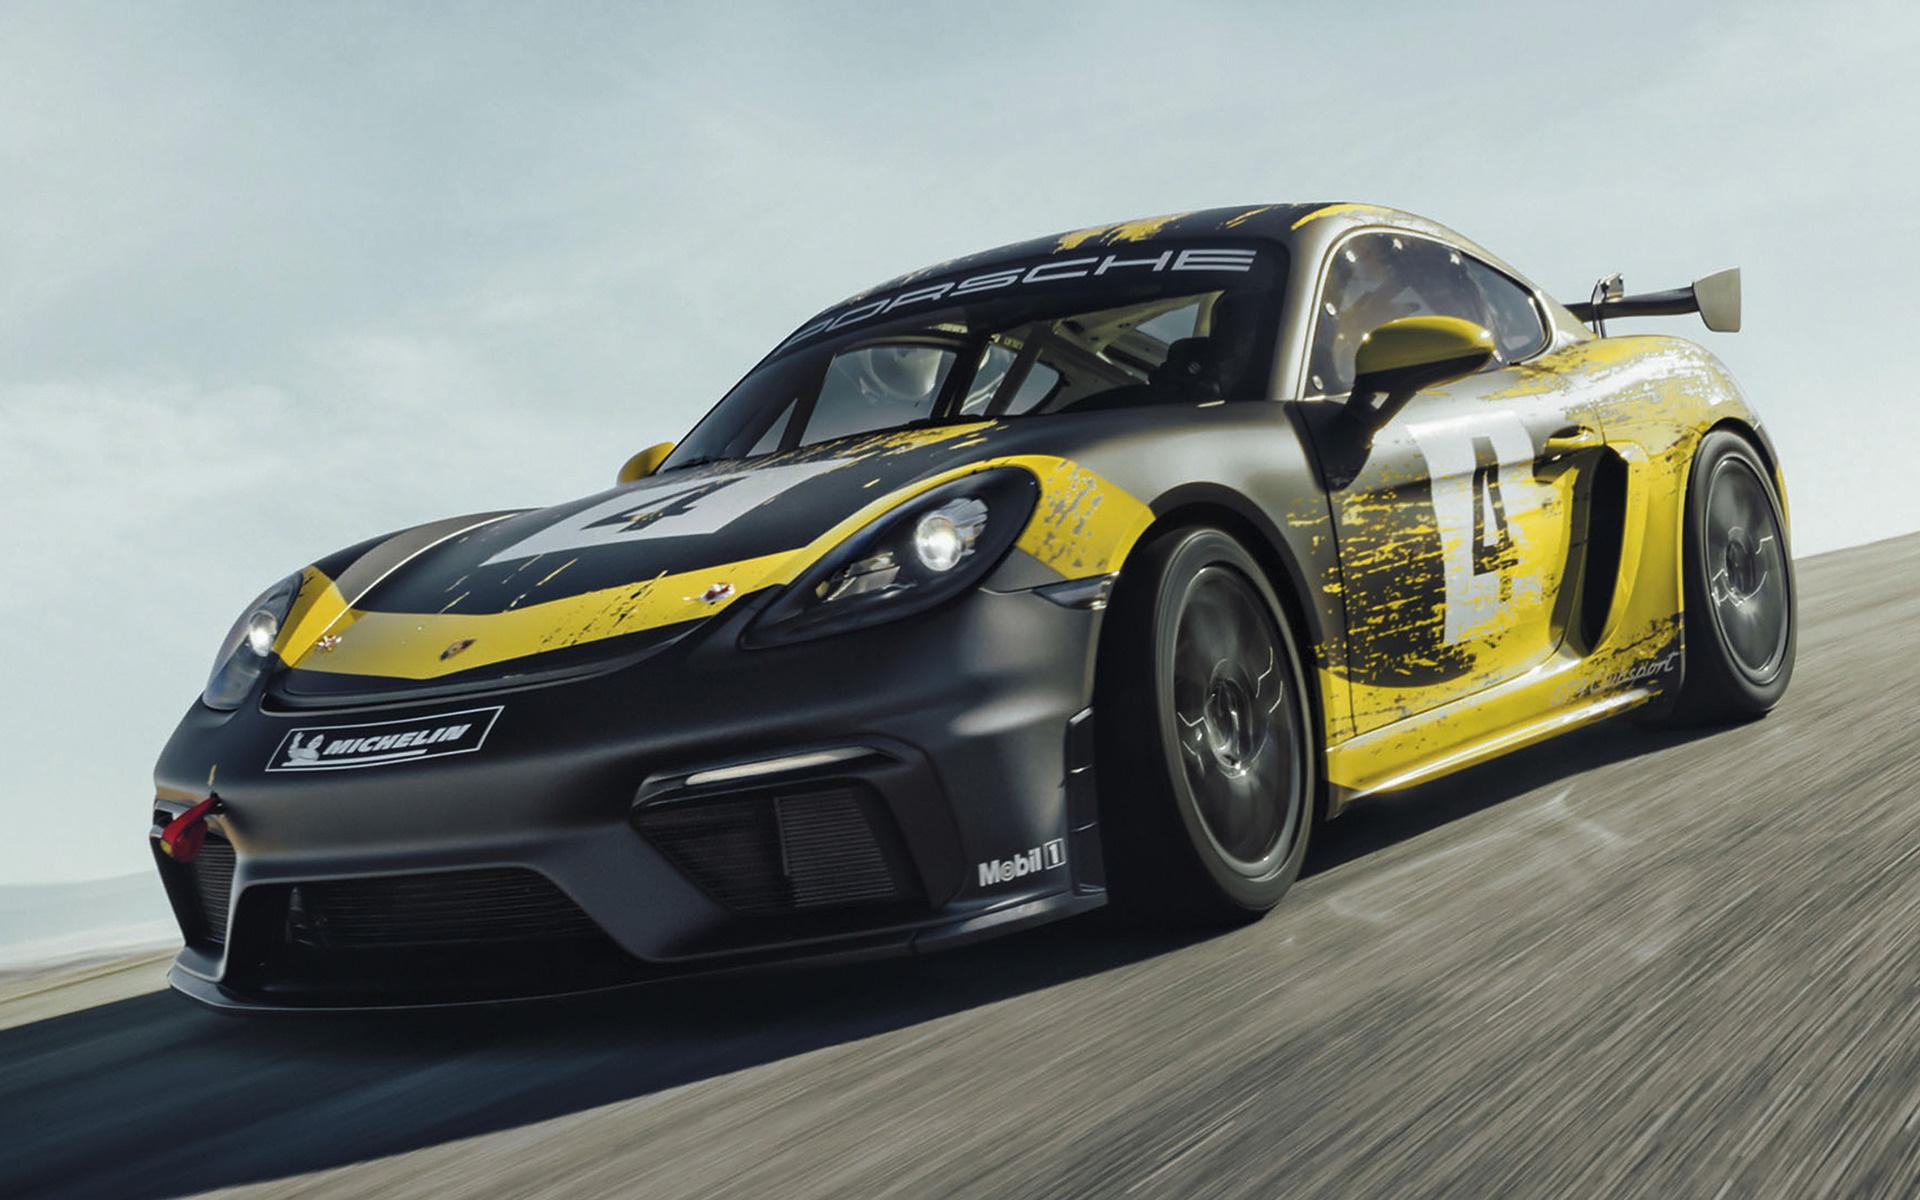 Land Rover Sport >> 2019 Porsche 718 Cayman GT4 Clubsport - Wallpapers and HD Images | Car Pixel